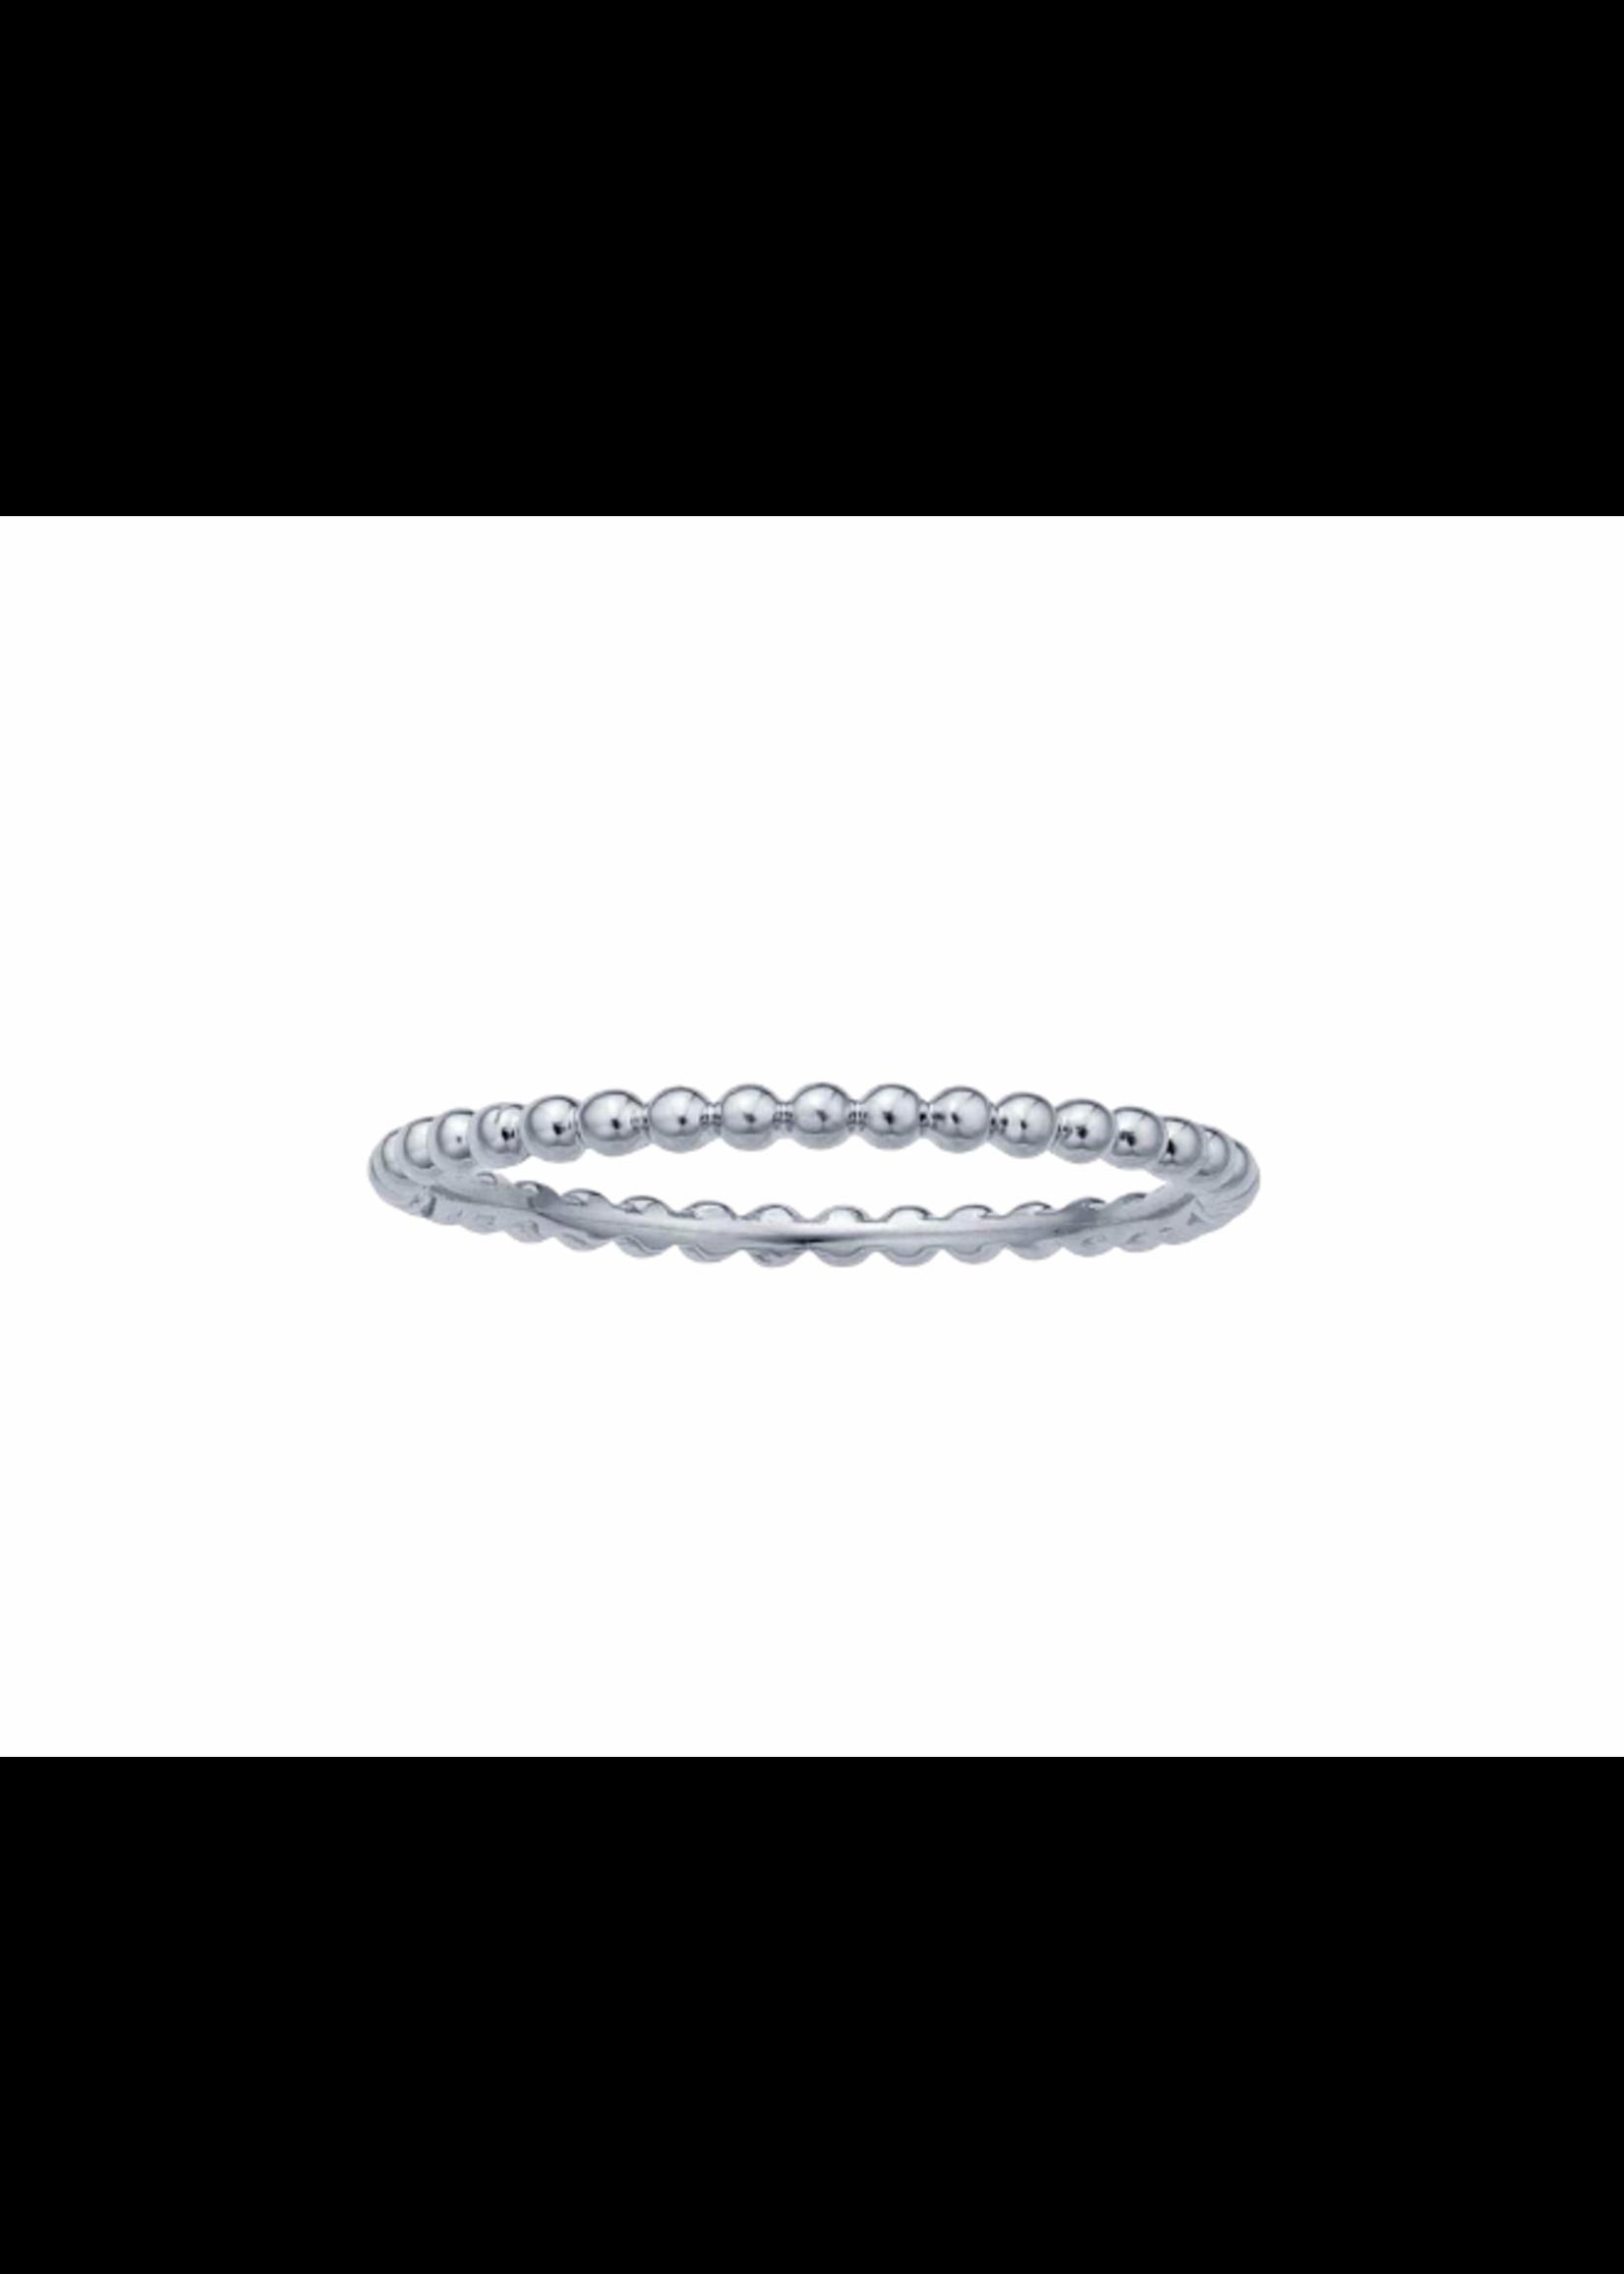 Jill Alberts White Gold Beaded Ring